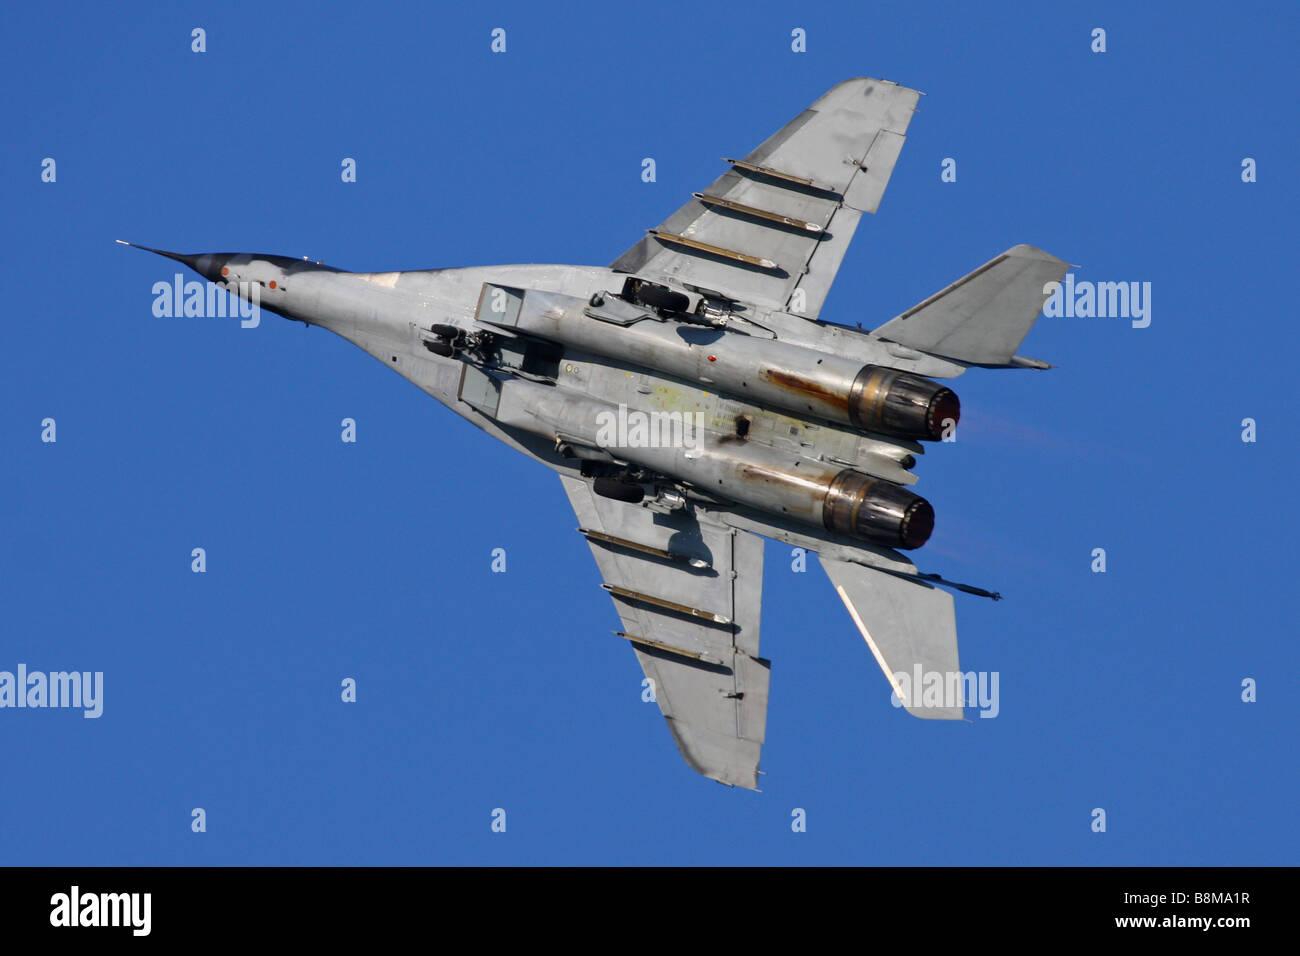 Flying military combat jet. - Stock Image